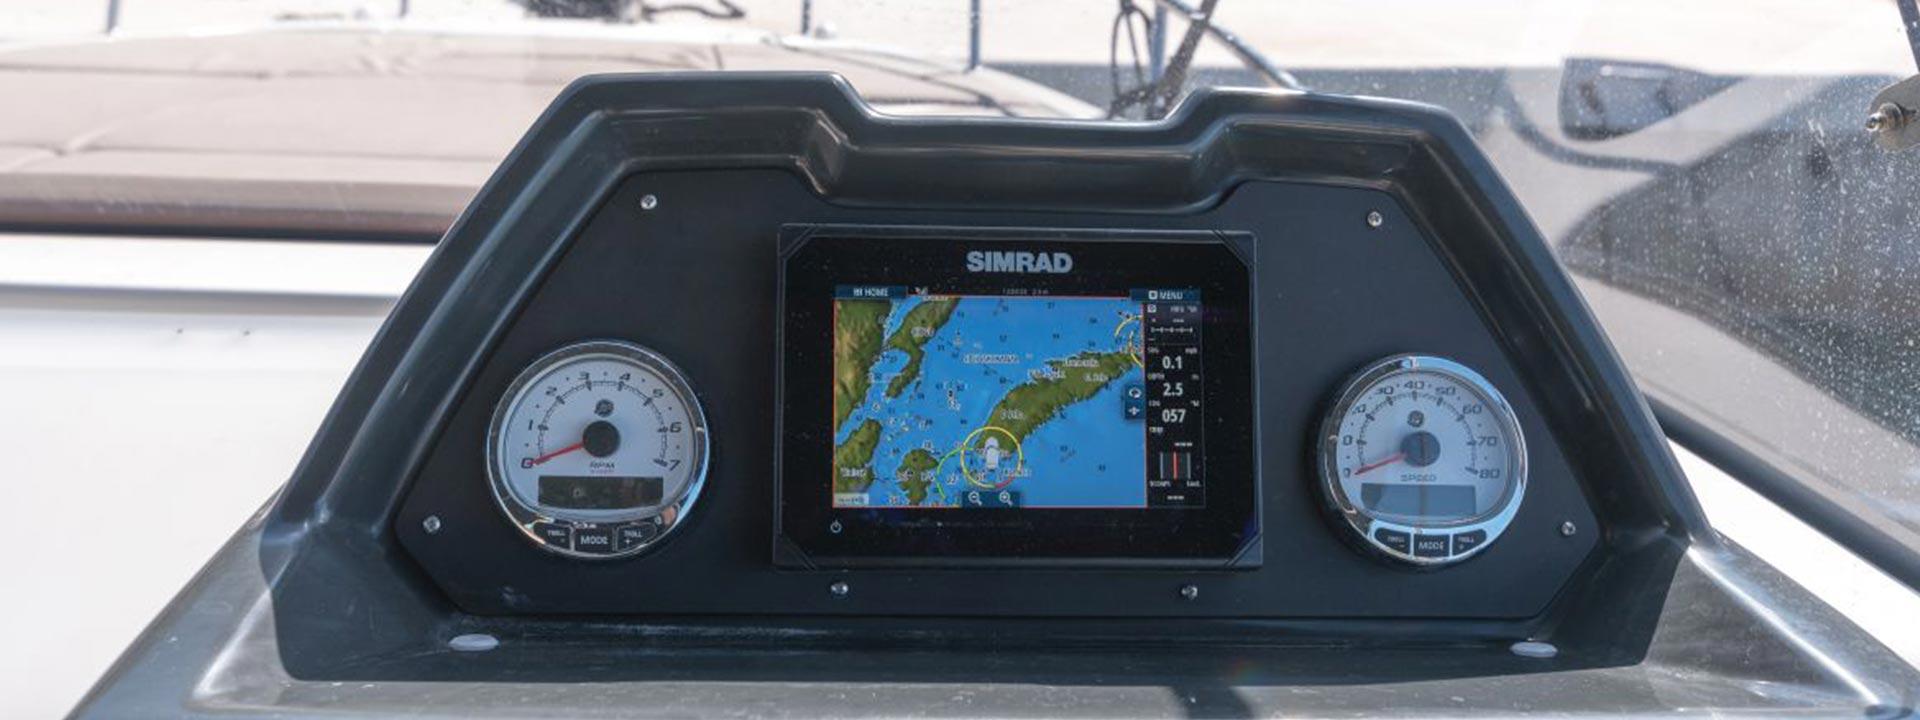 mayer-charter-boat-header-quicksilver-activ-755-sundeck-03